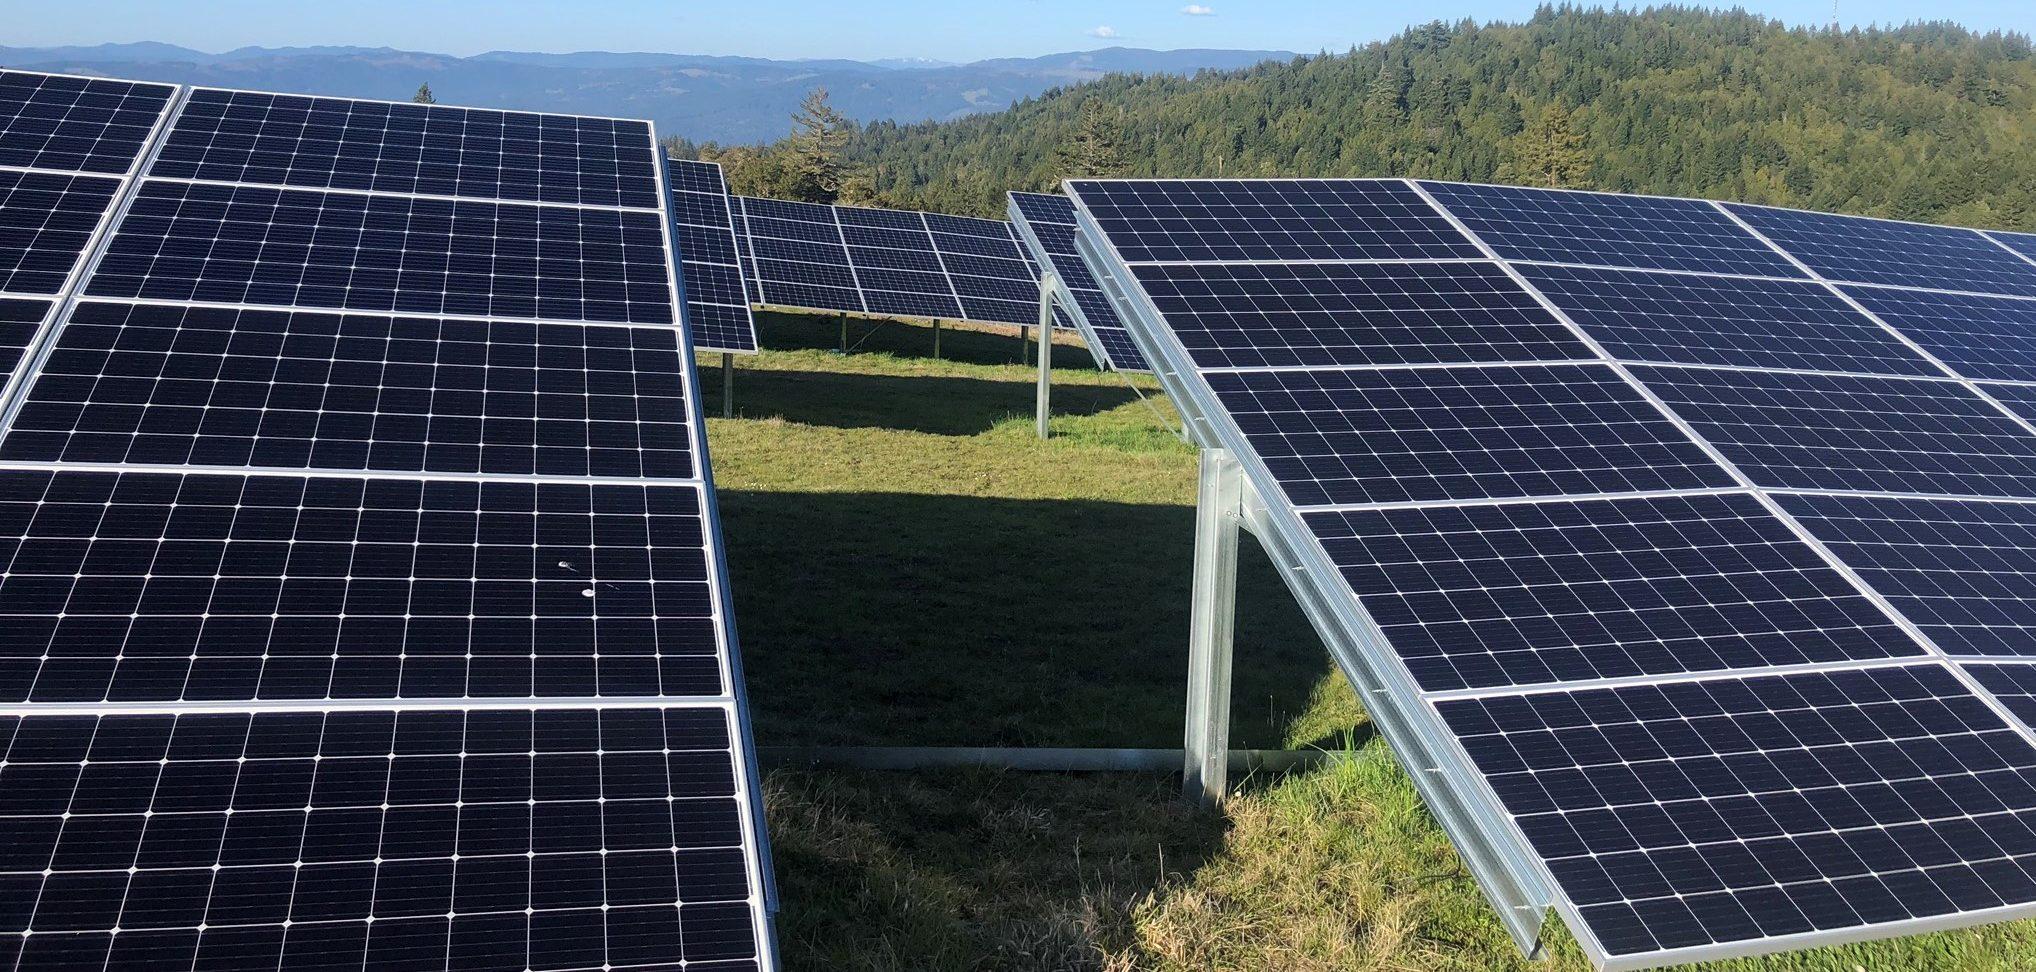 KEET solar panels in Kneeland